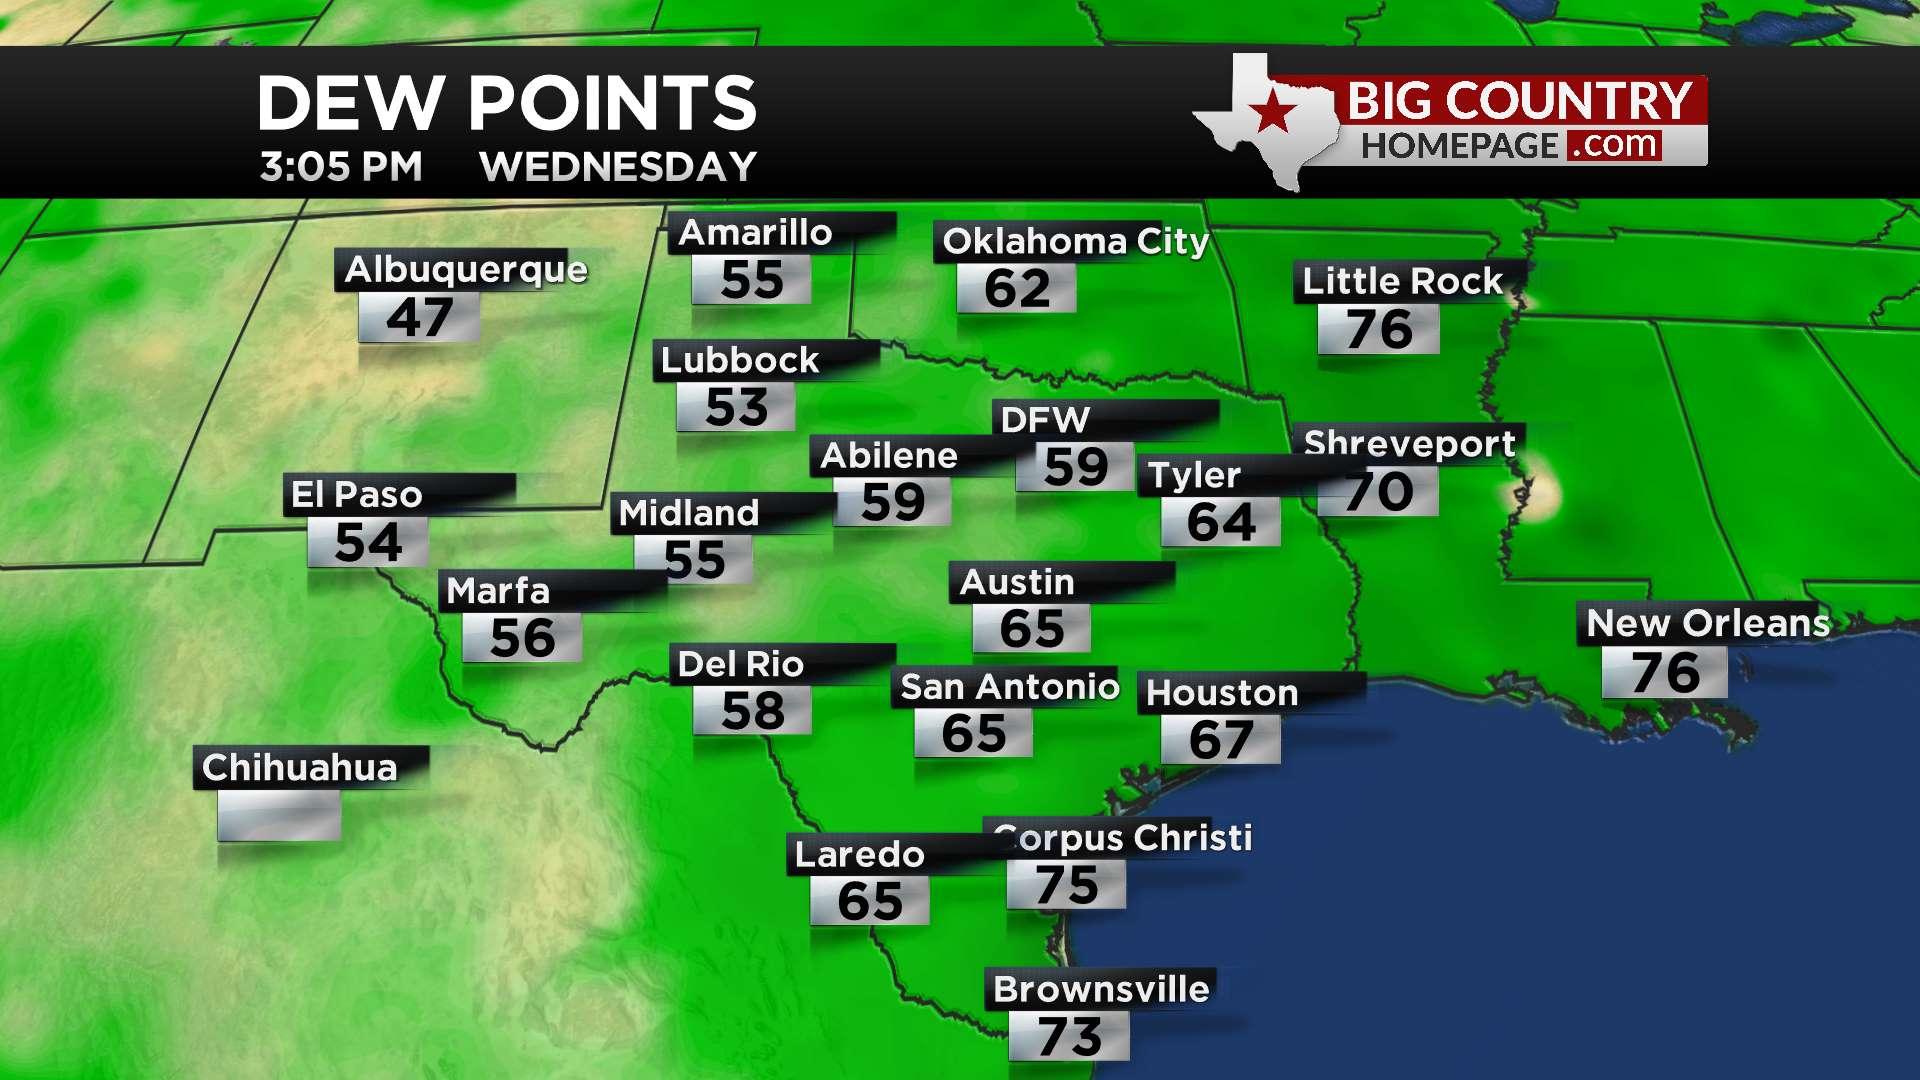 Texas Dewpoints